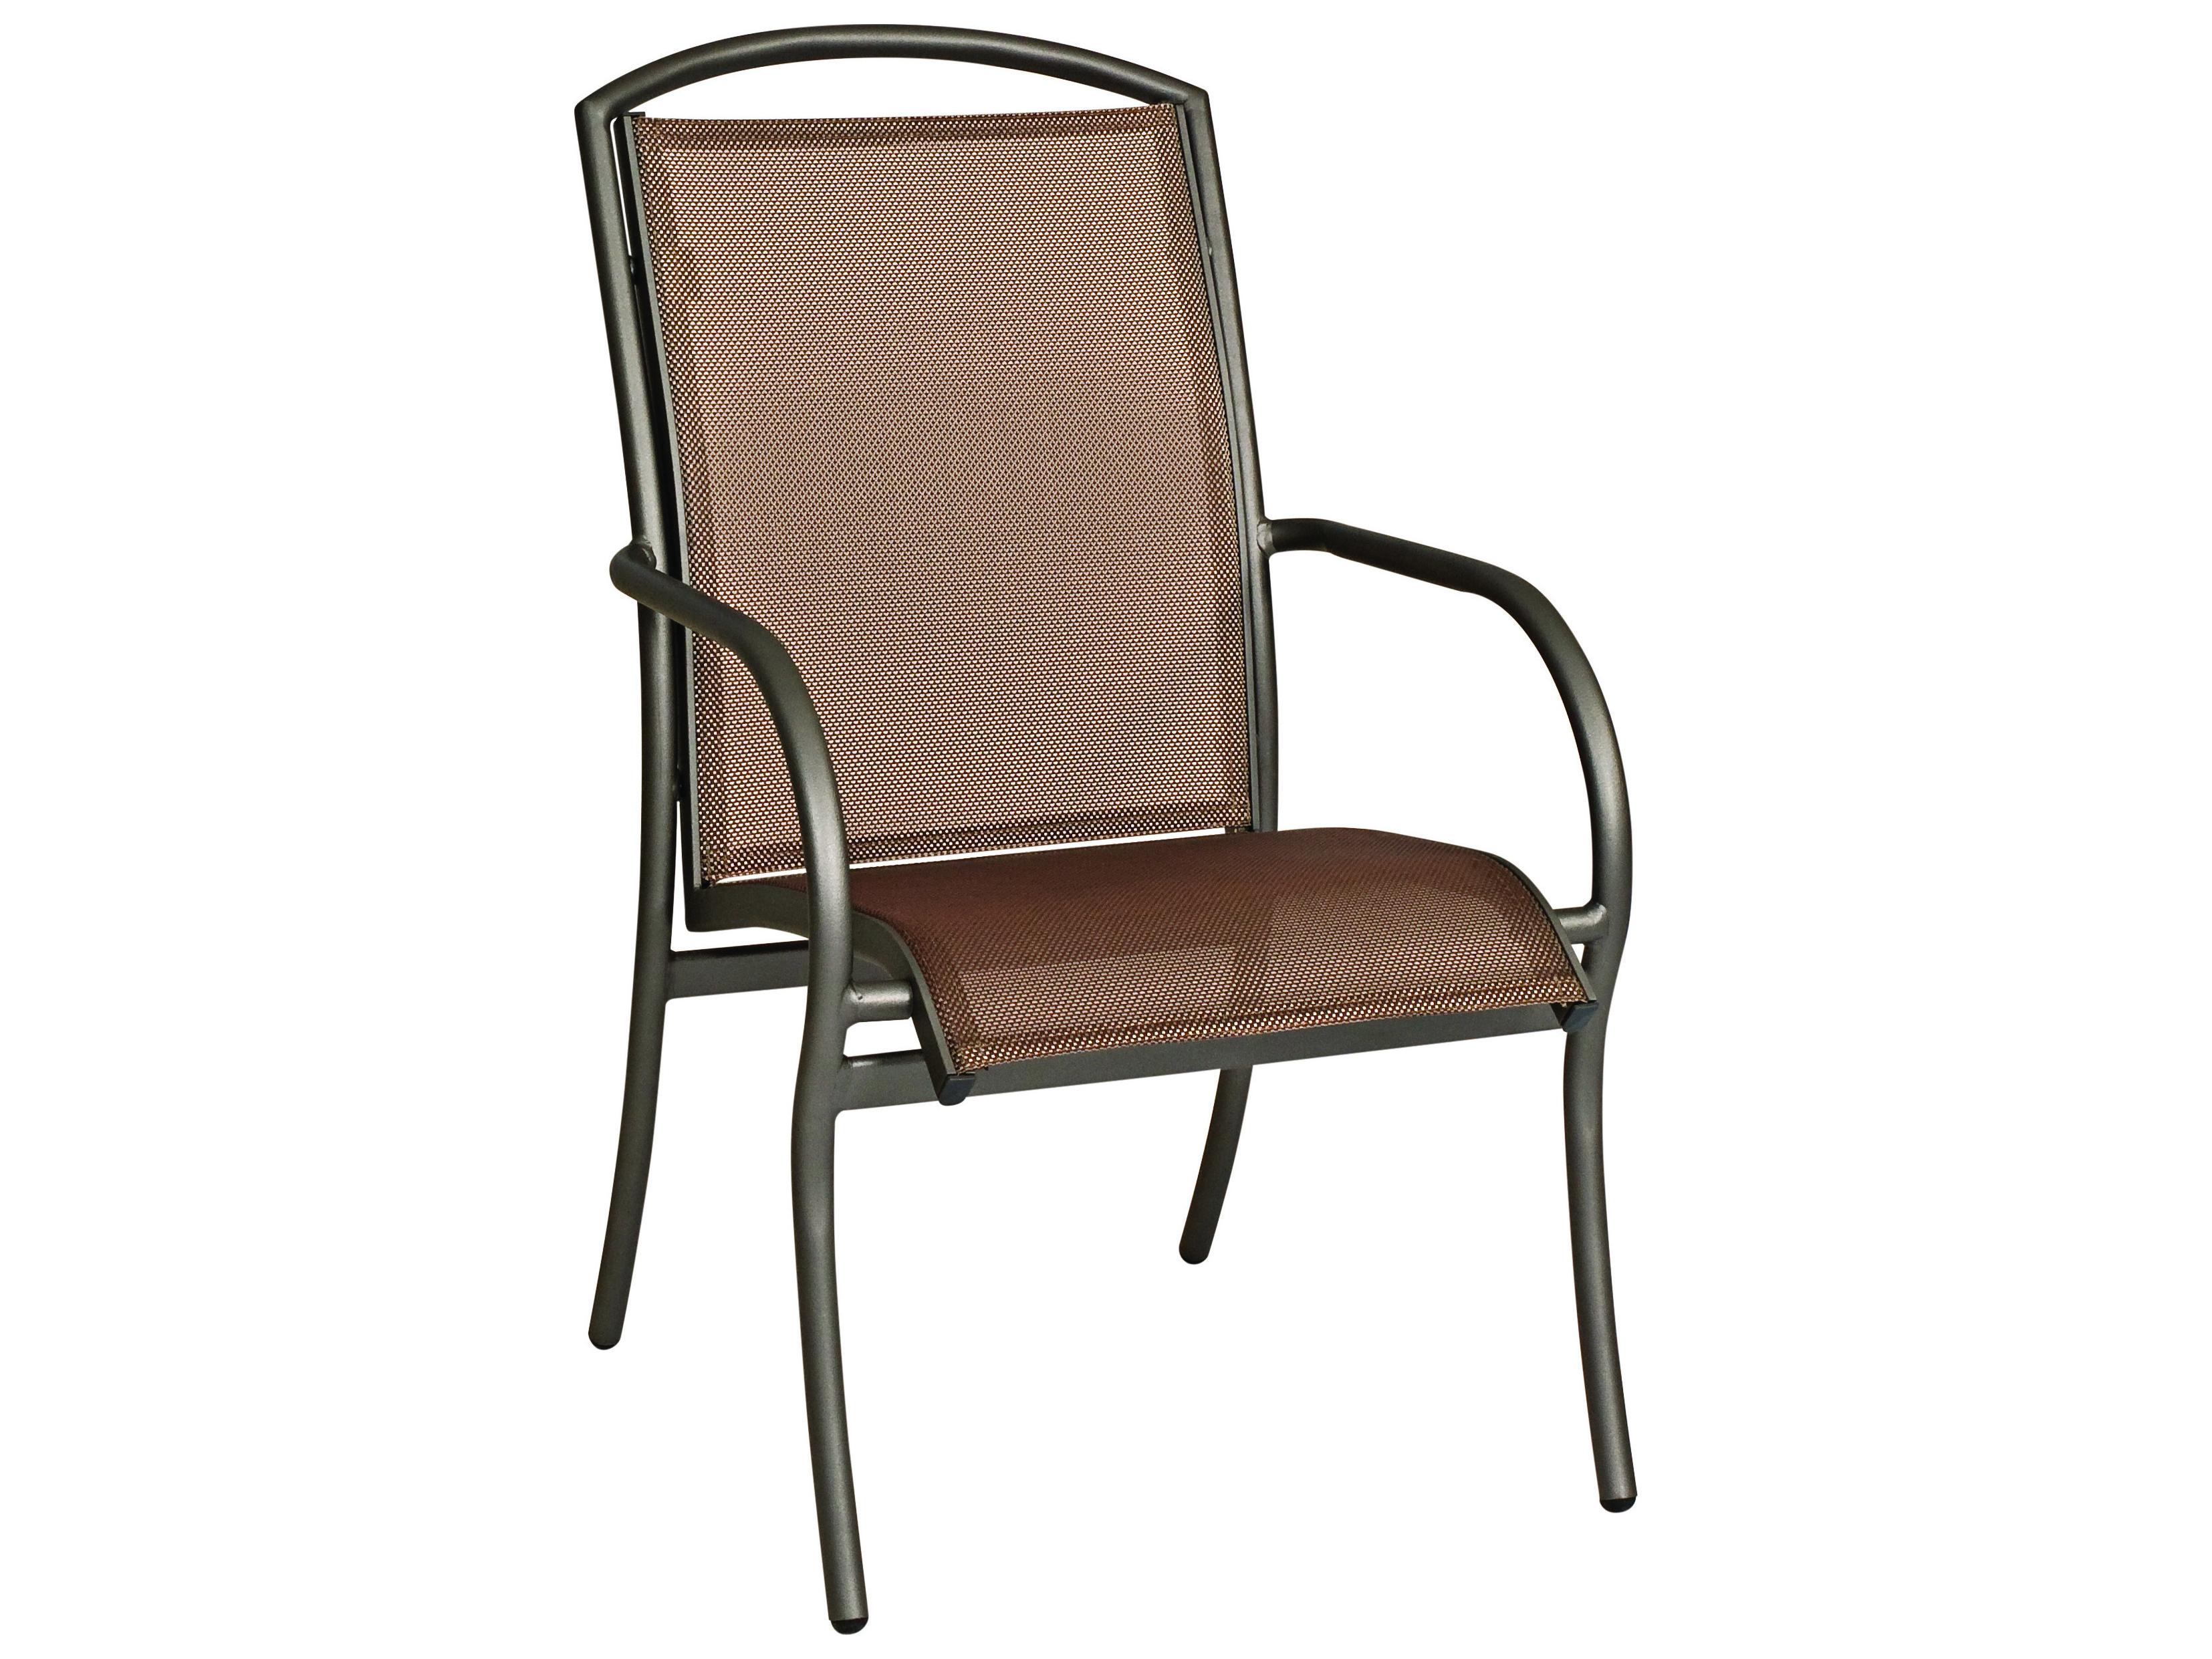 Woodard Rivington Sling Aluminum Dining Chair